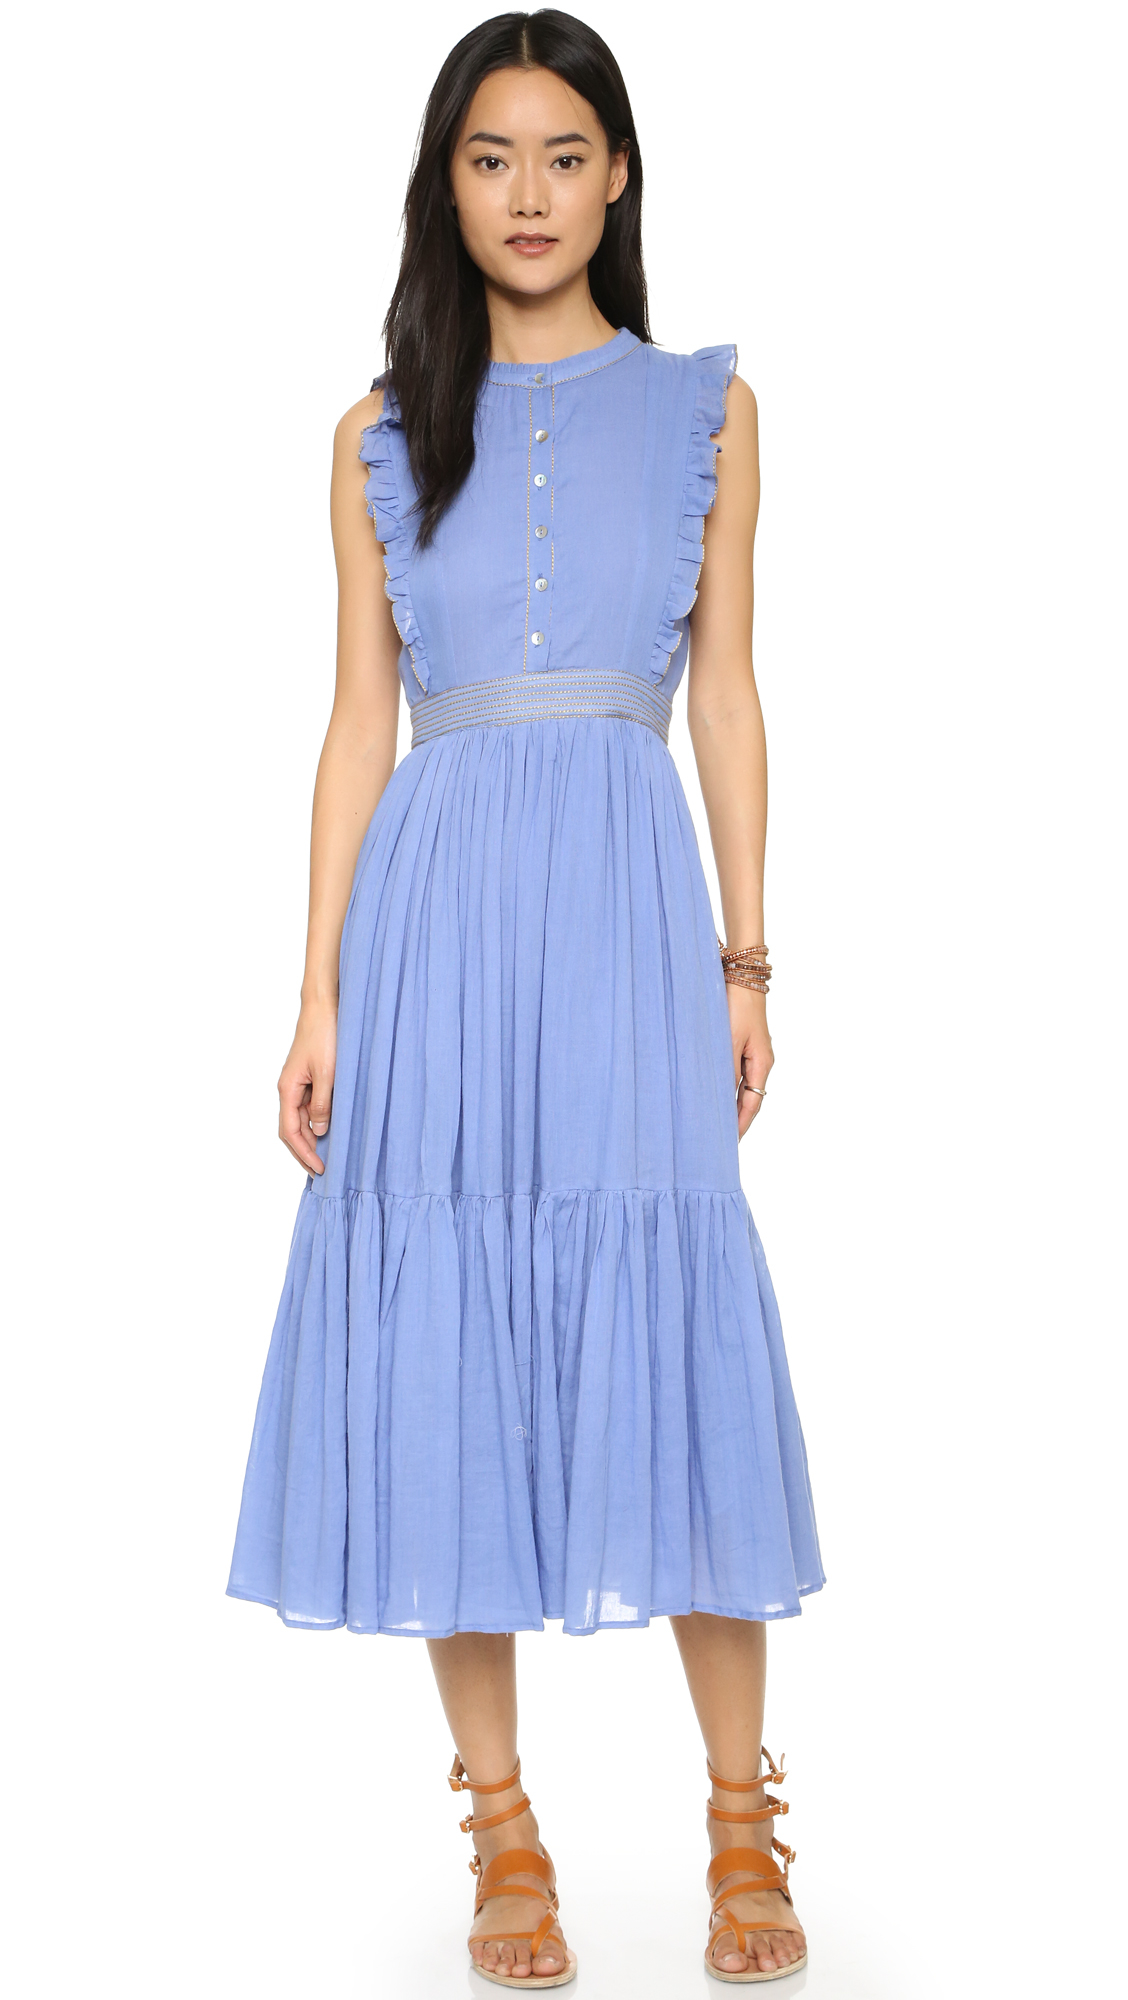 Carolina Blue Dresses   Dress images